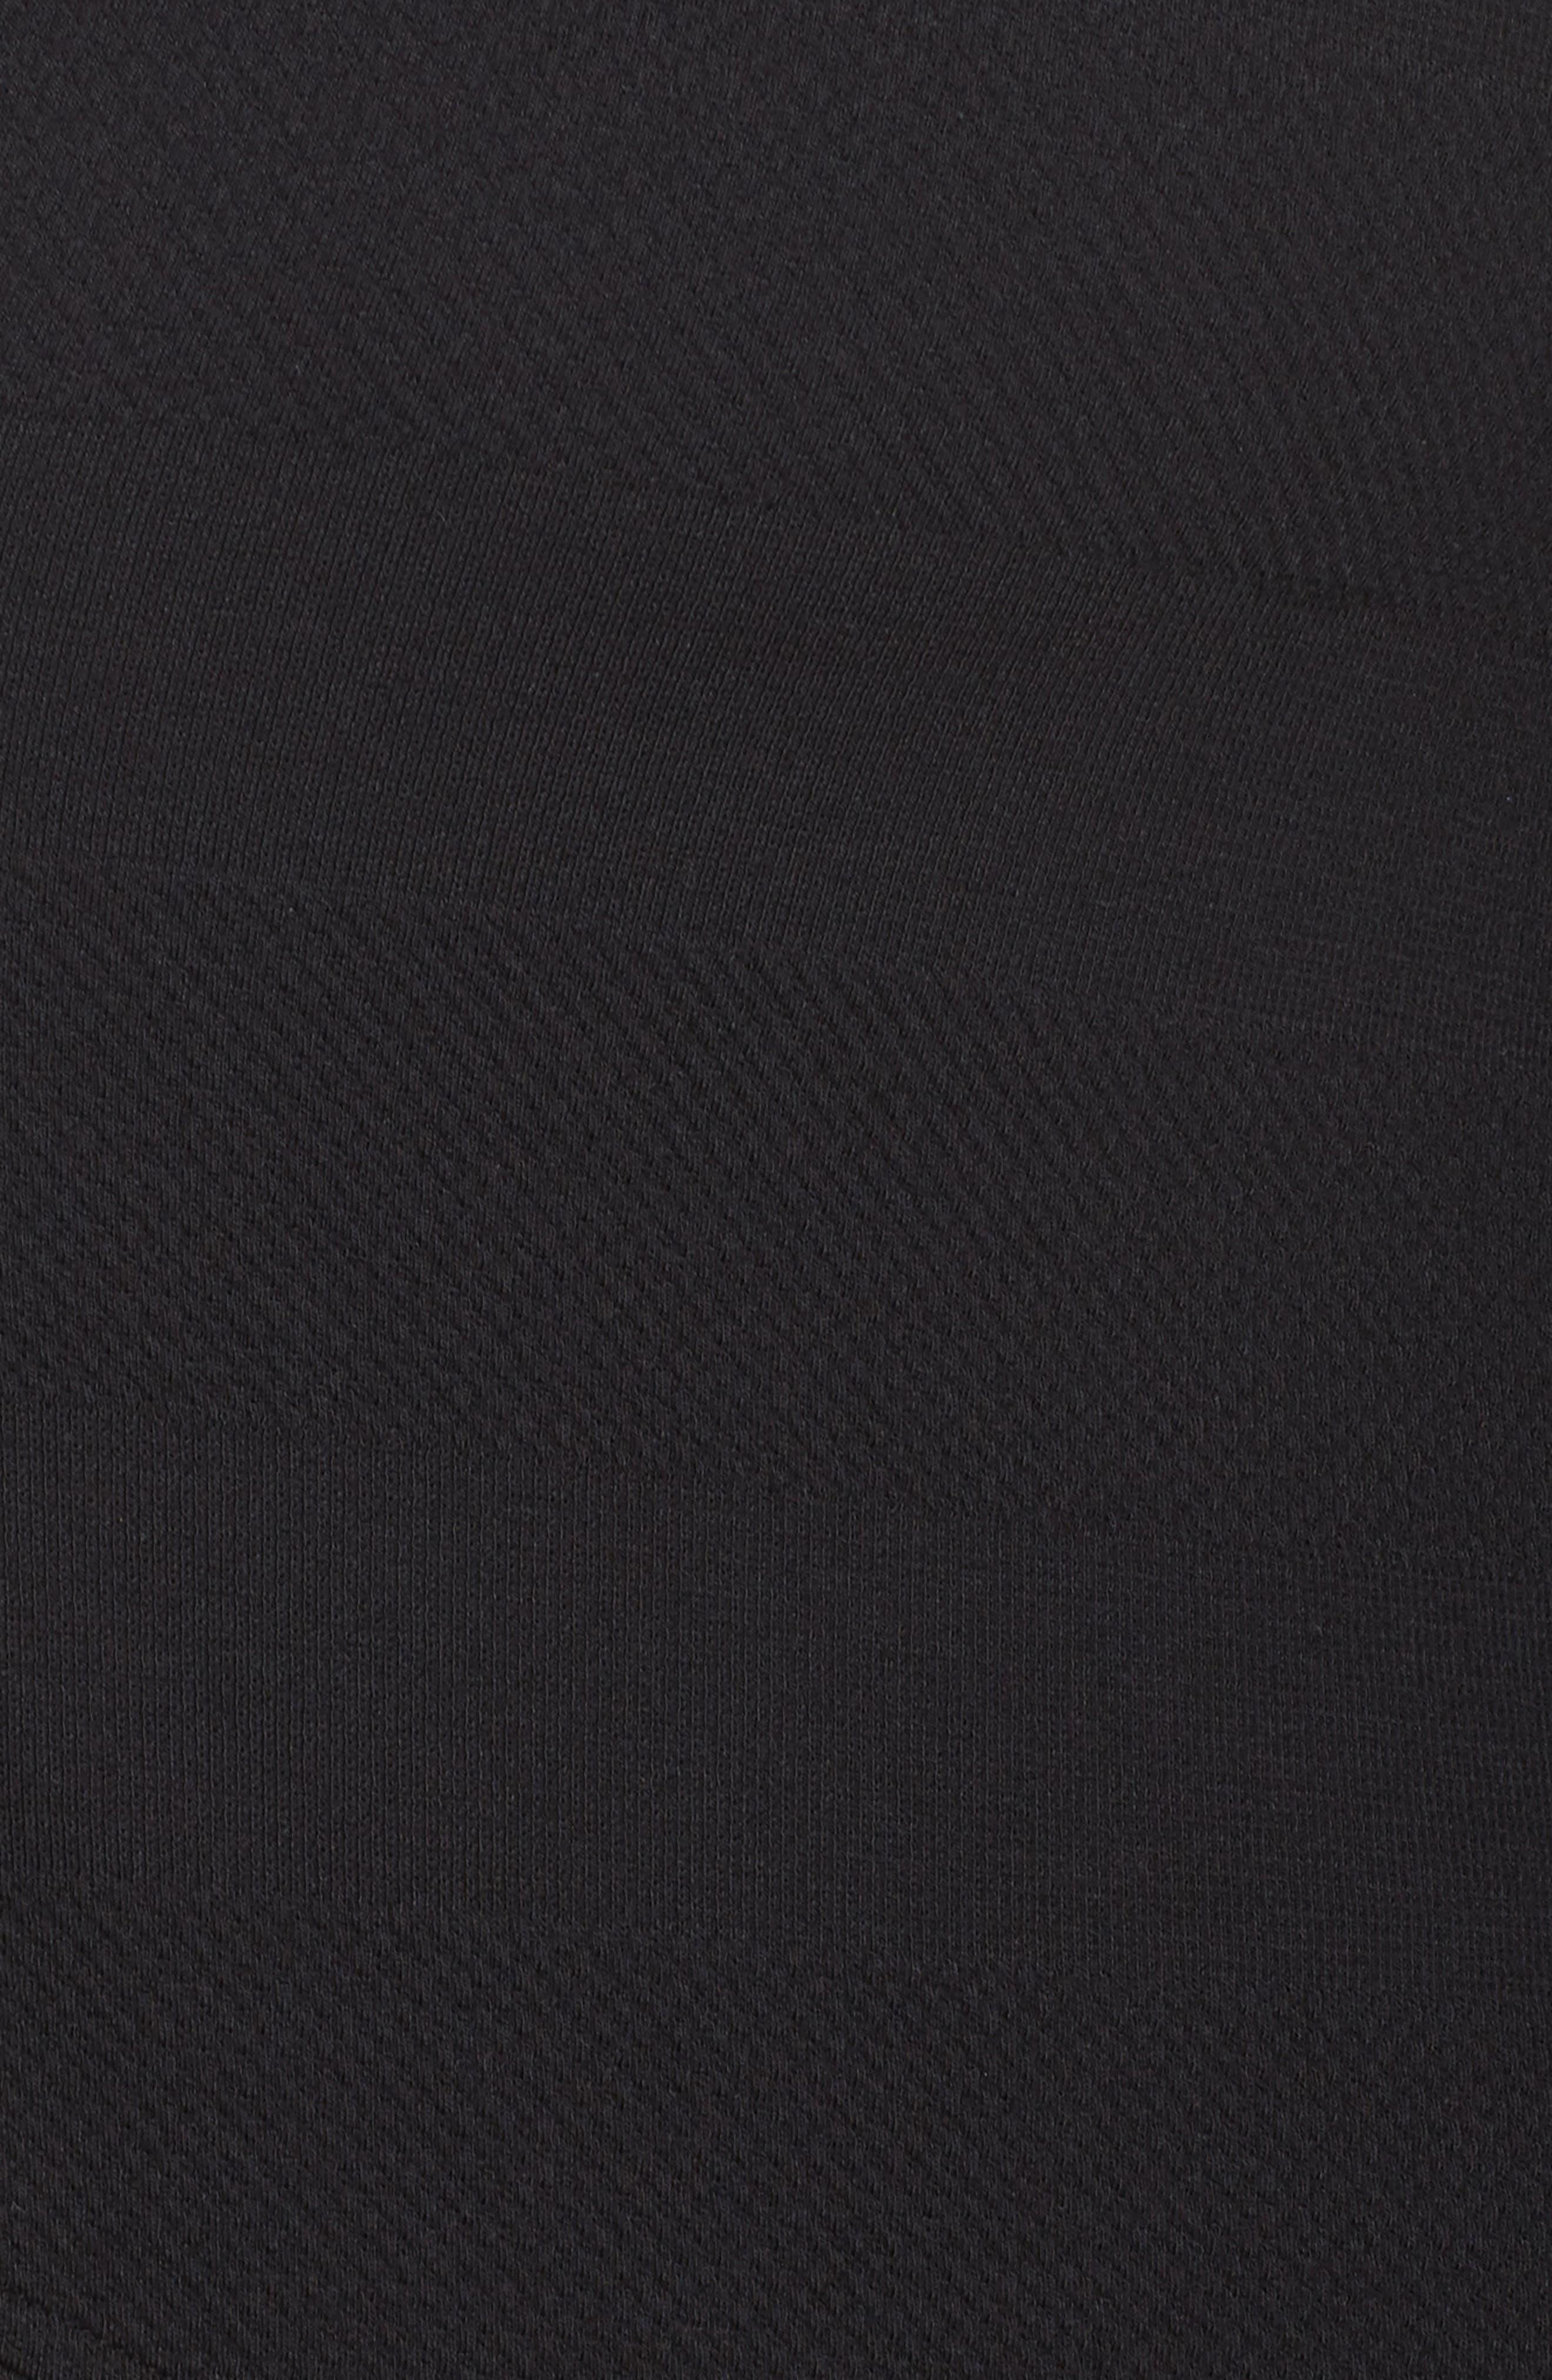 Ria Hooded Cardigan,                             Alternate thumbnail 5, color,                             Black